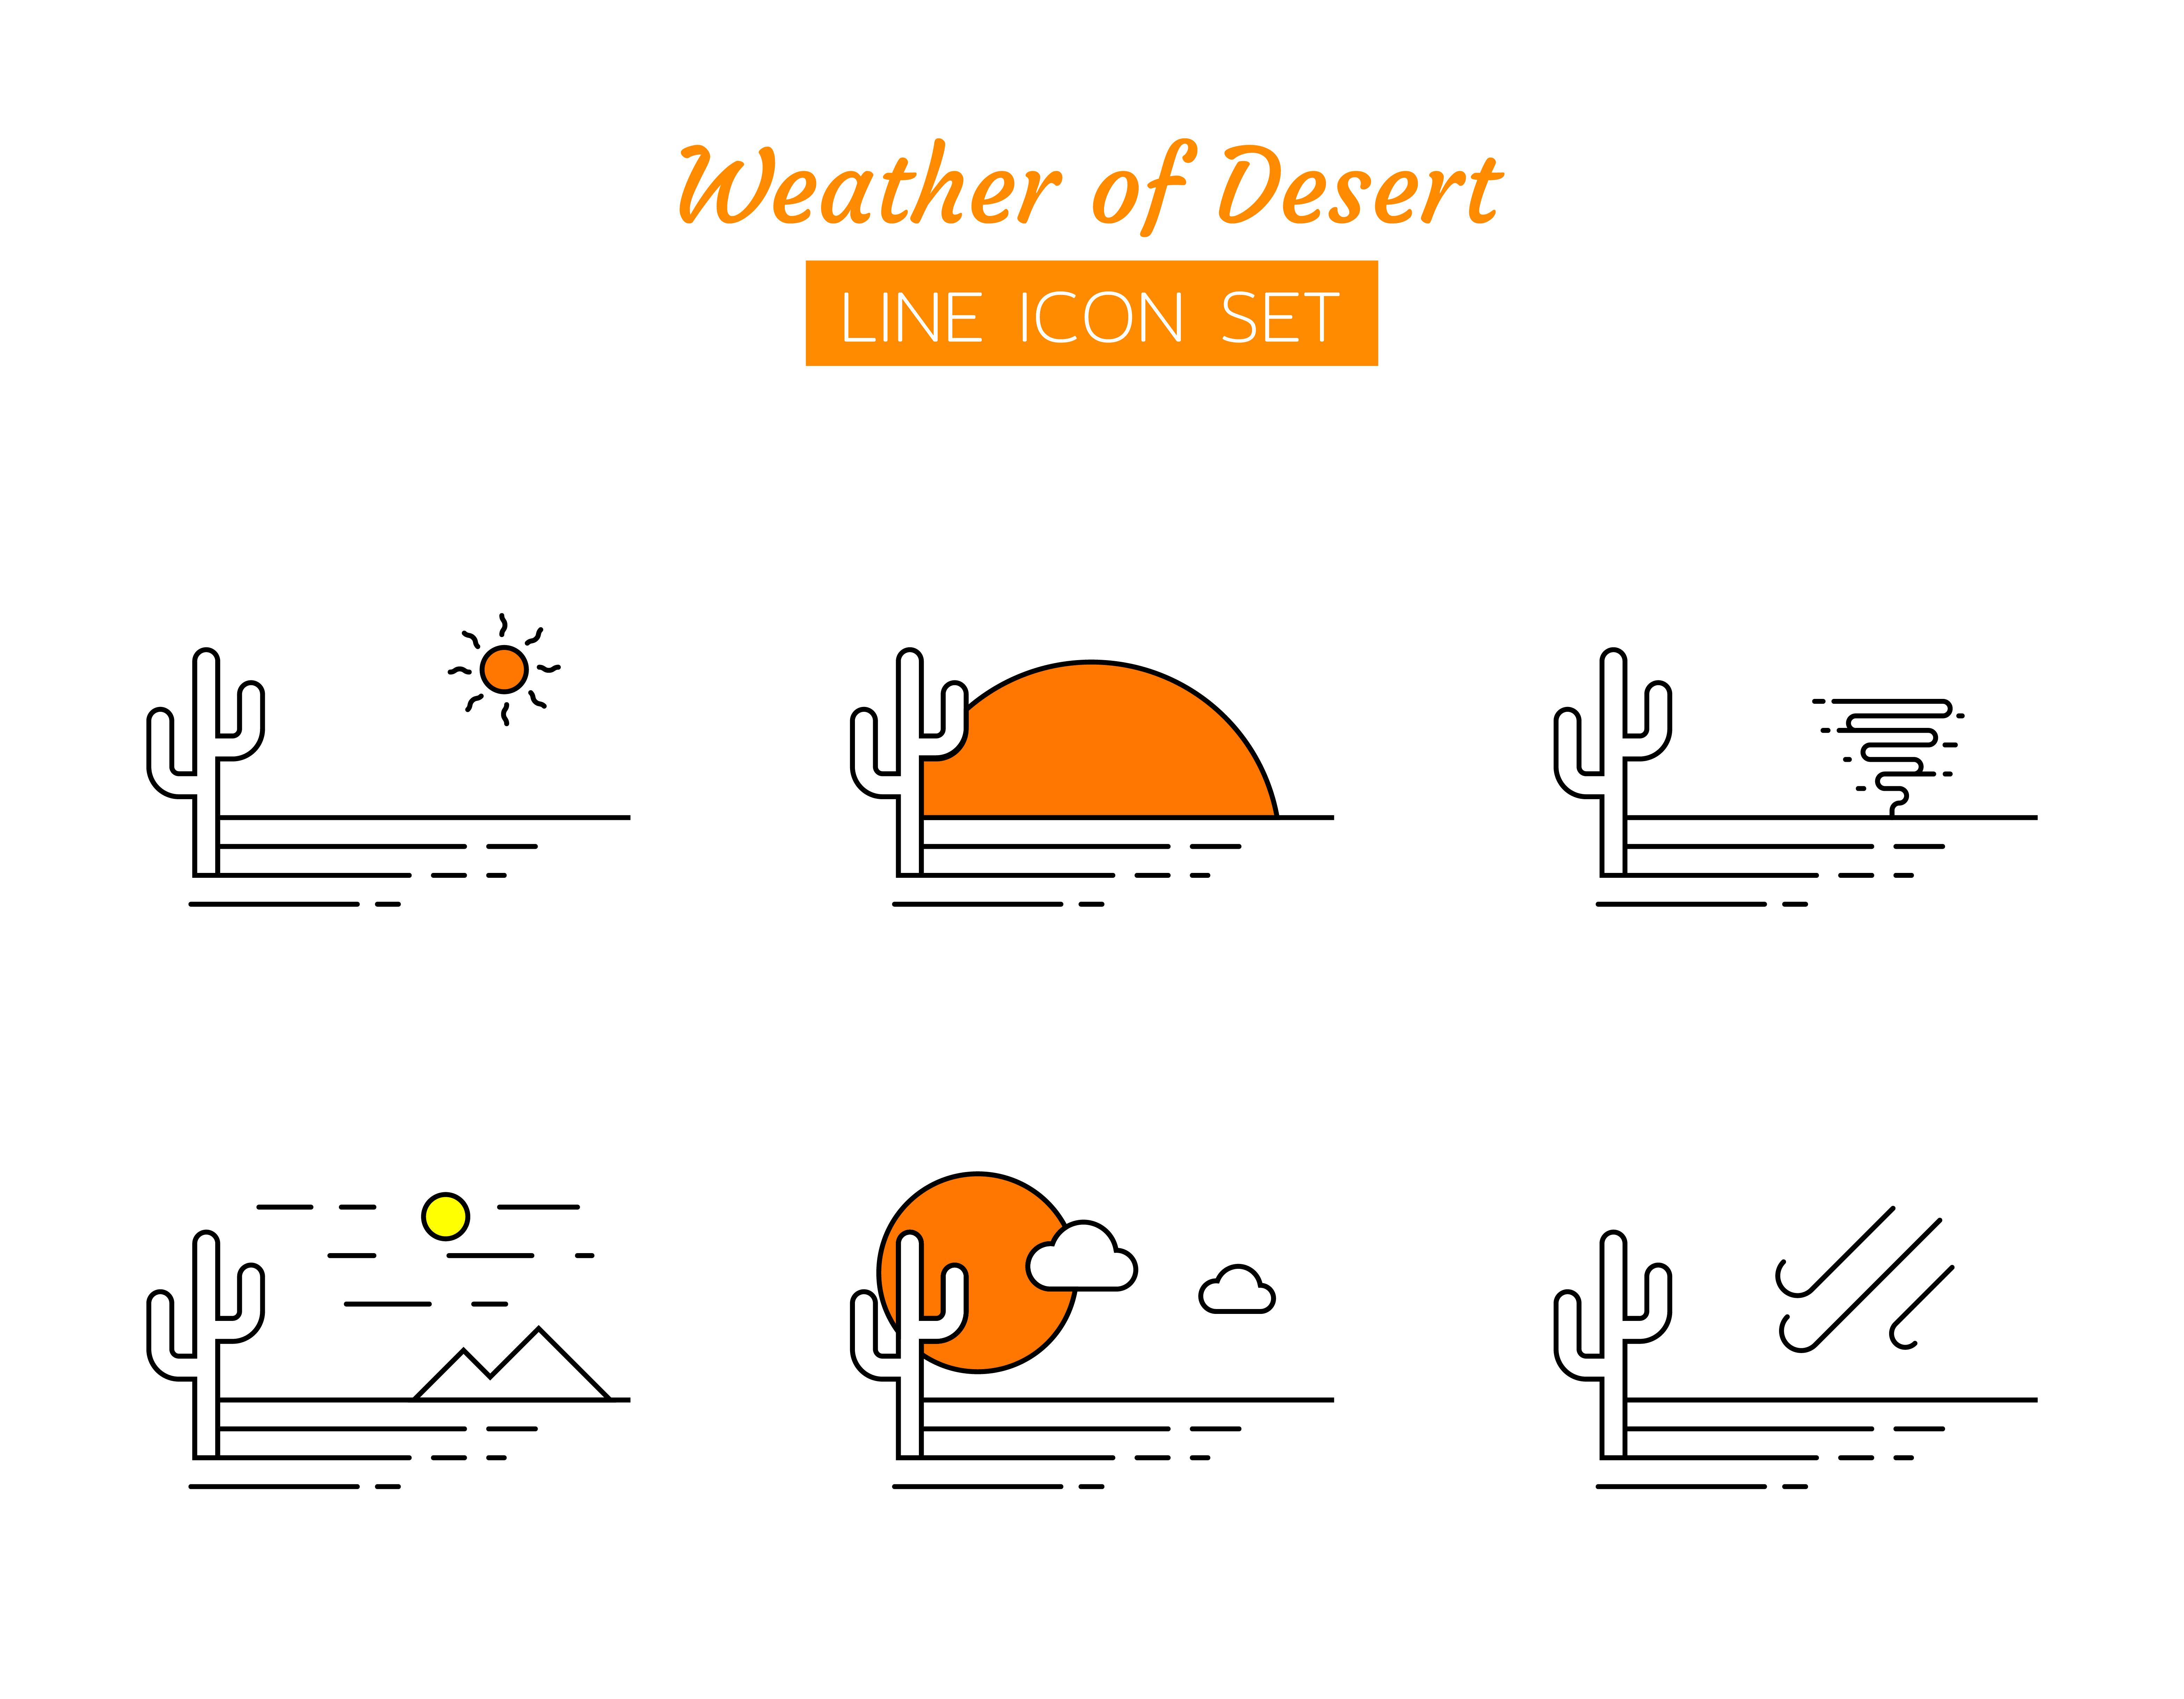 Desert weather line icon symbol set